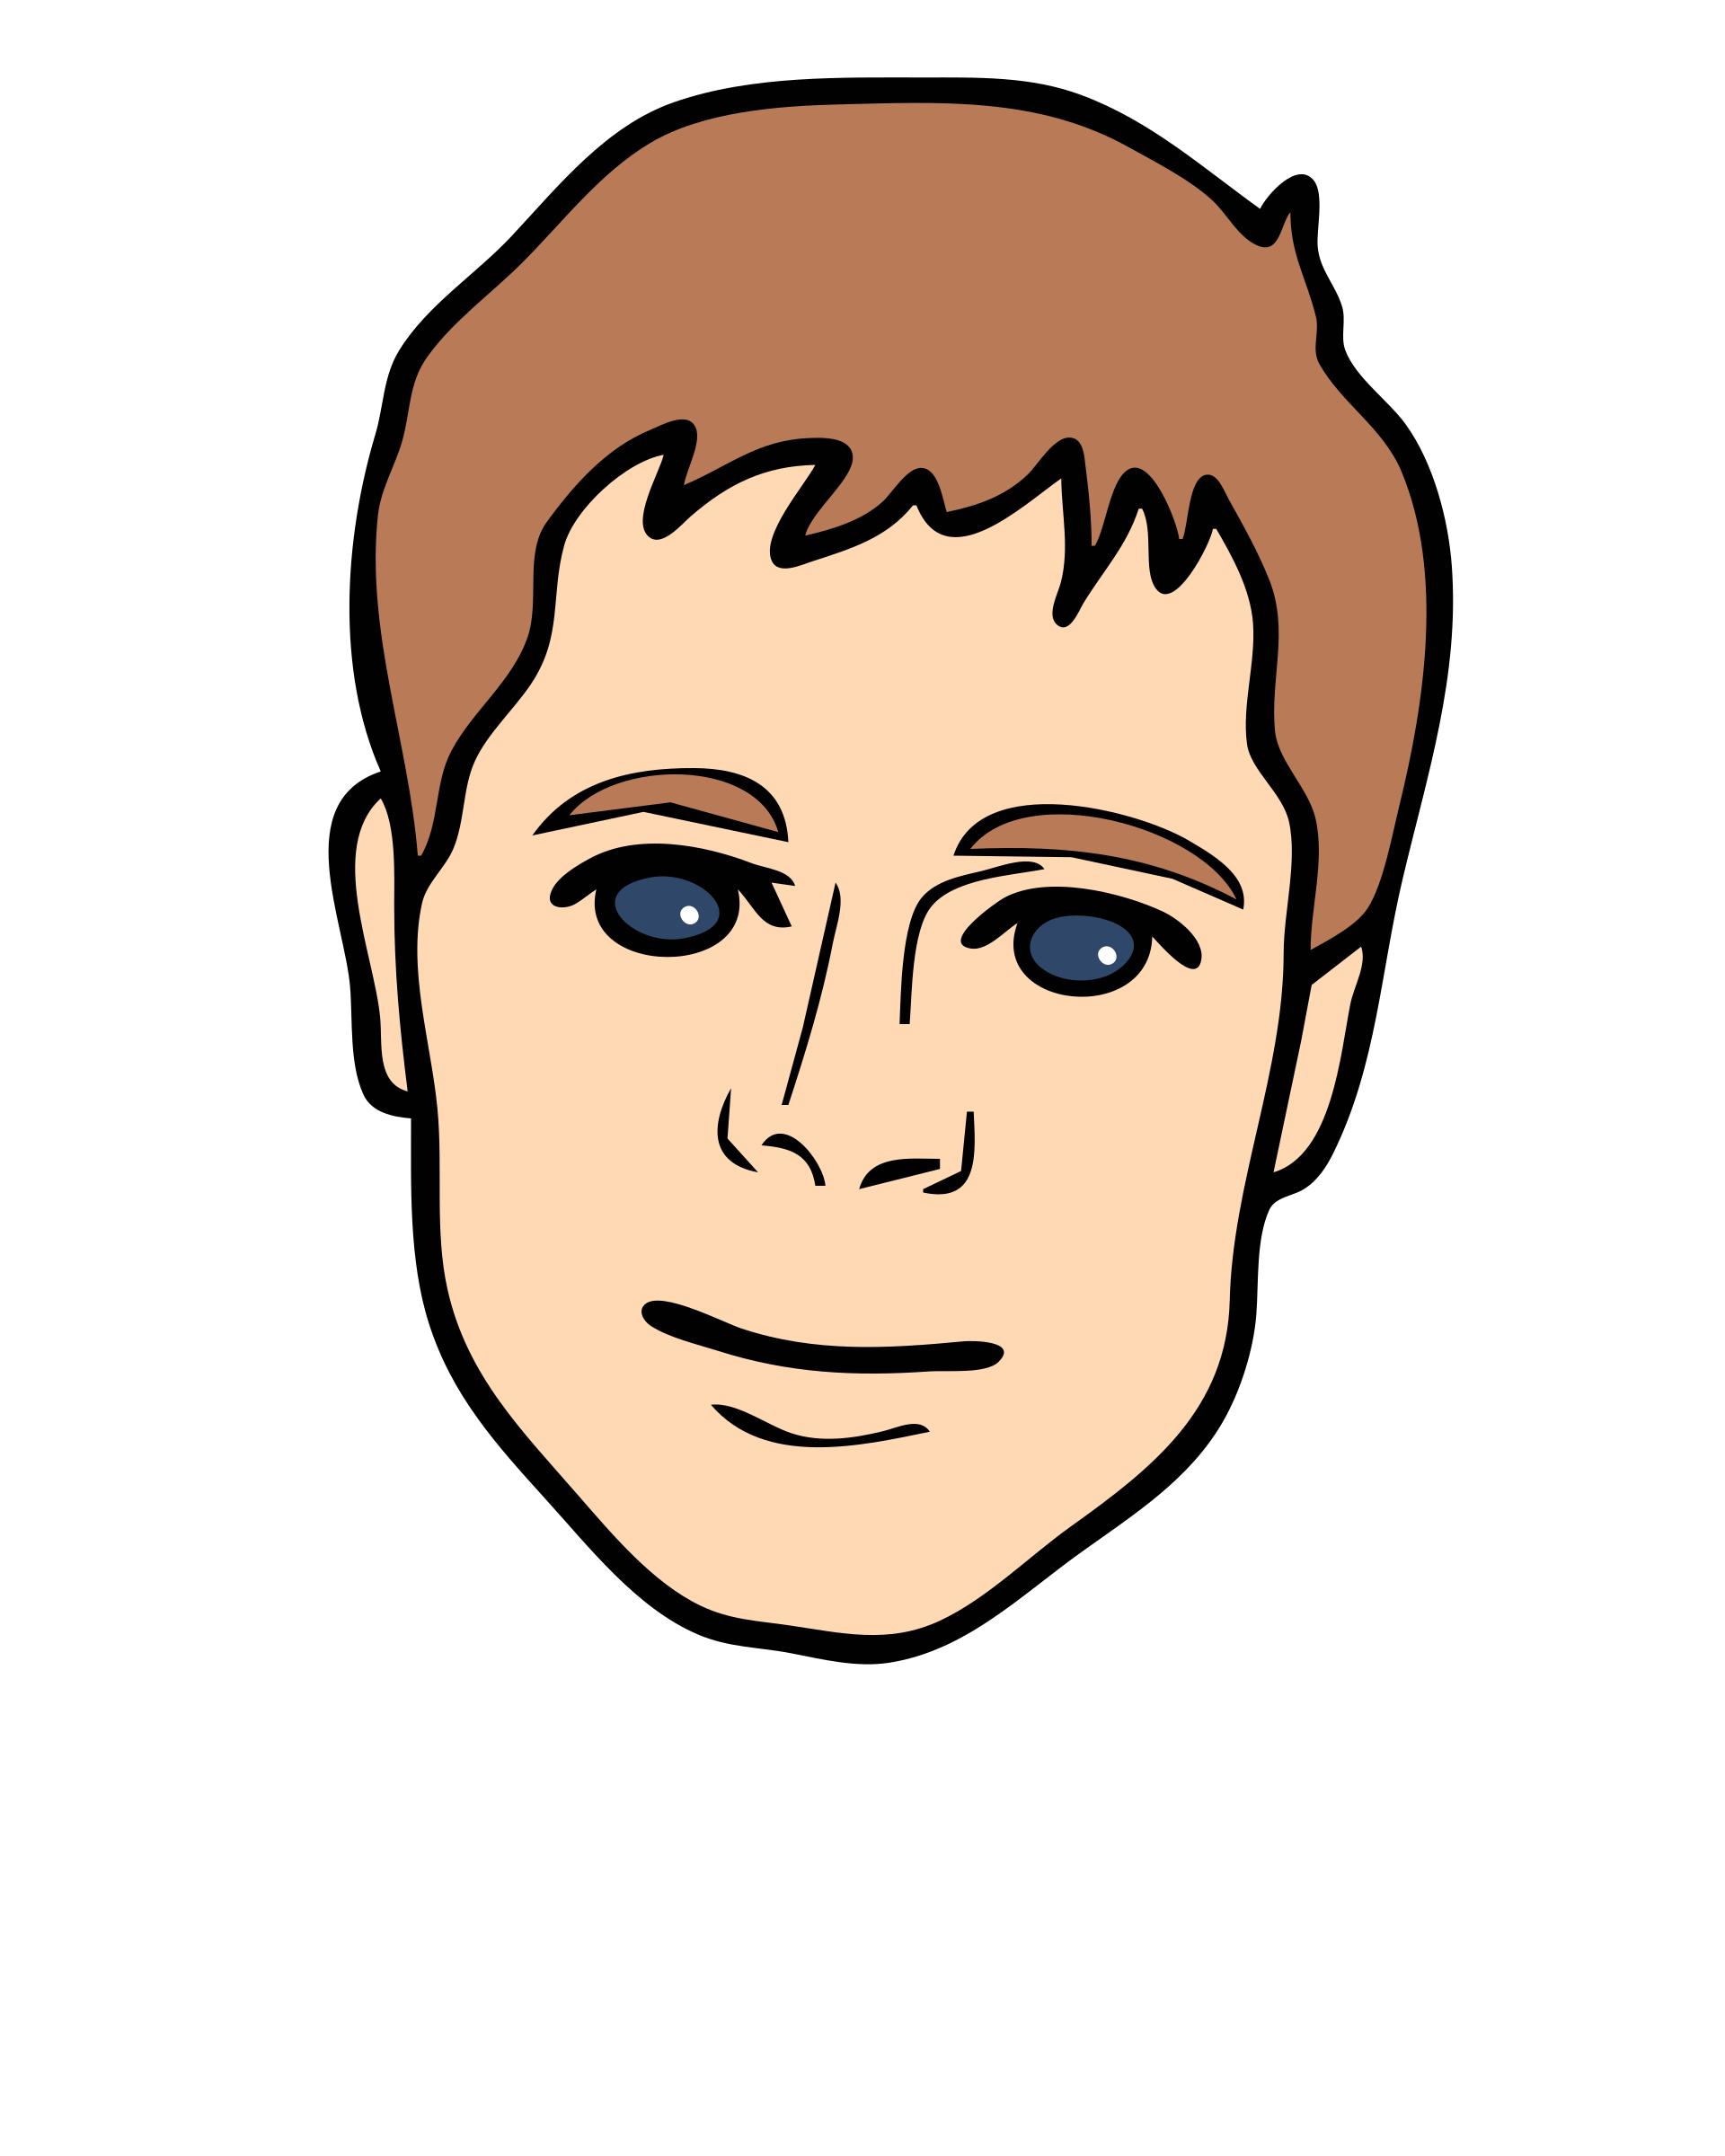 clipart human face - photo #26